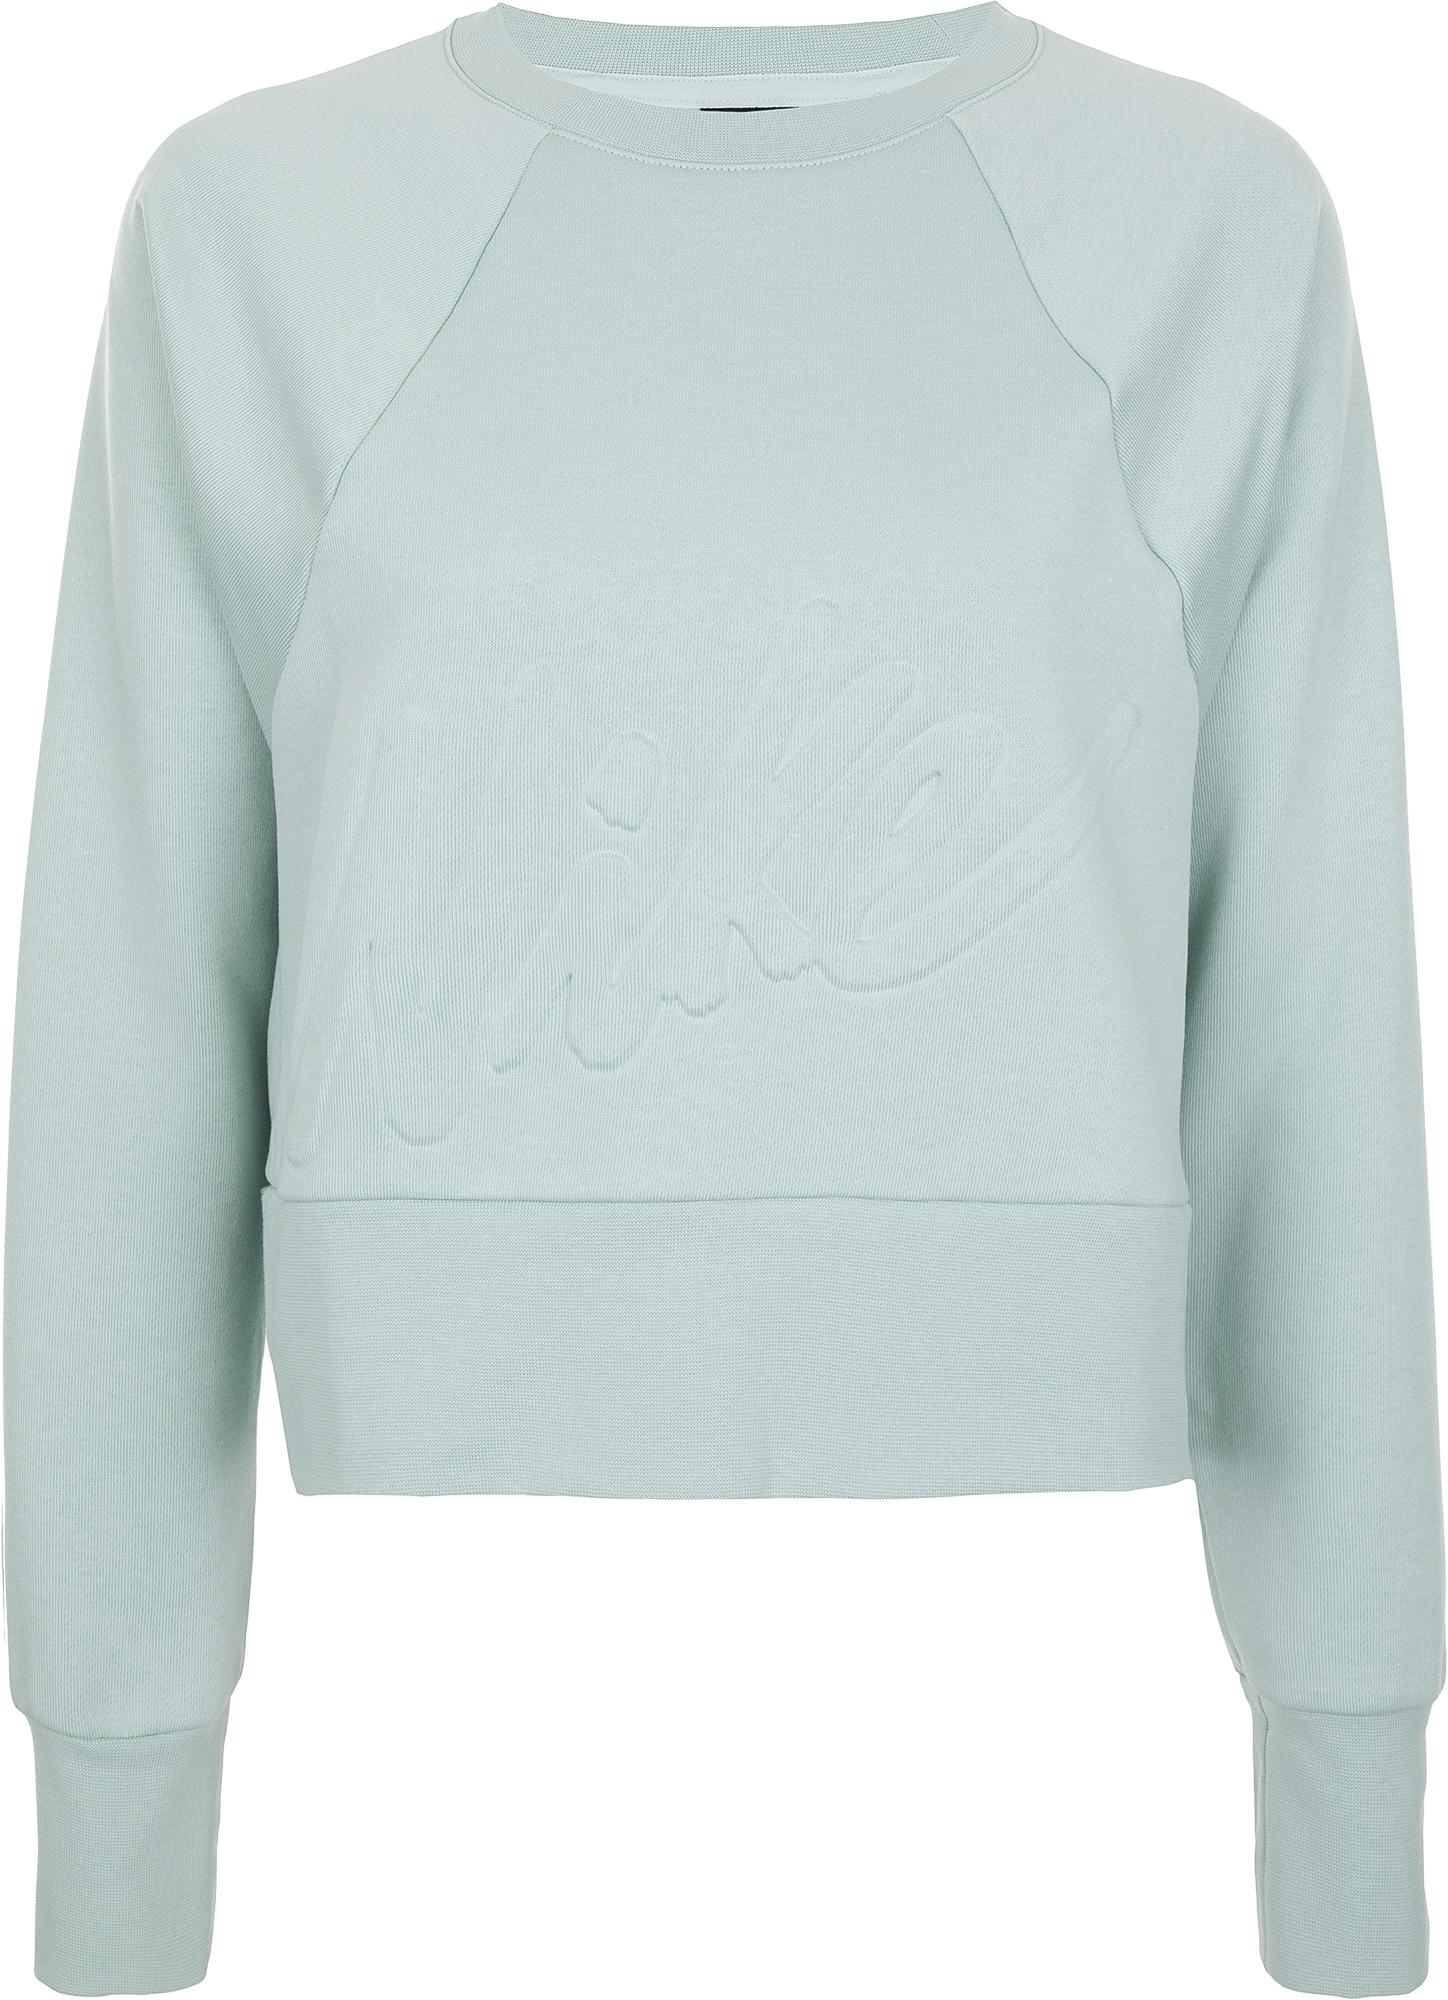 Nike Свитшот женский Nike Dry Get Fit, размер 46-48 цены онлайн